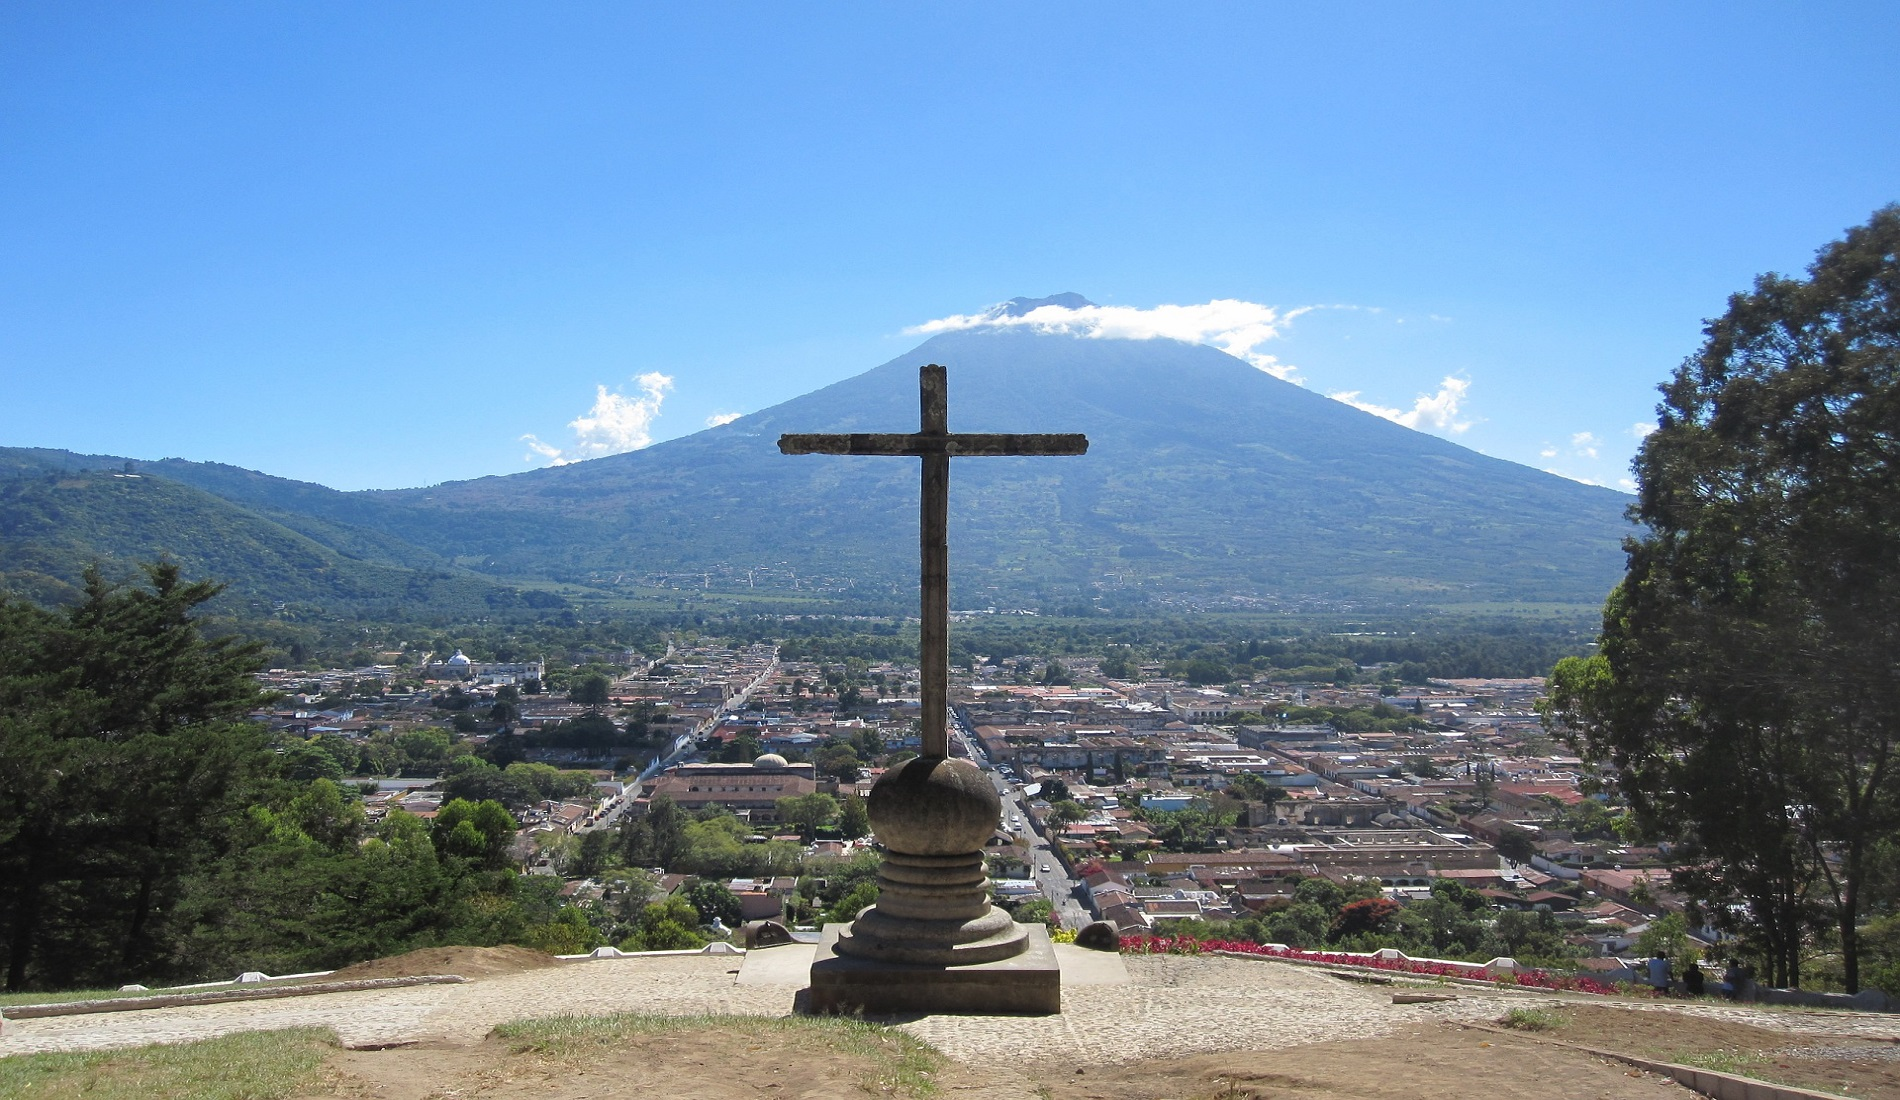 Agua vulkaan Guatemala